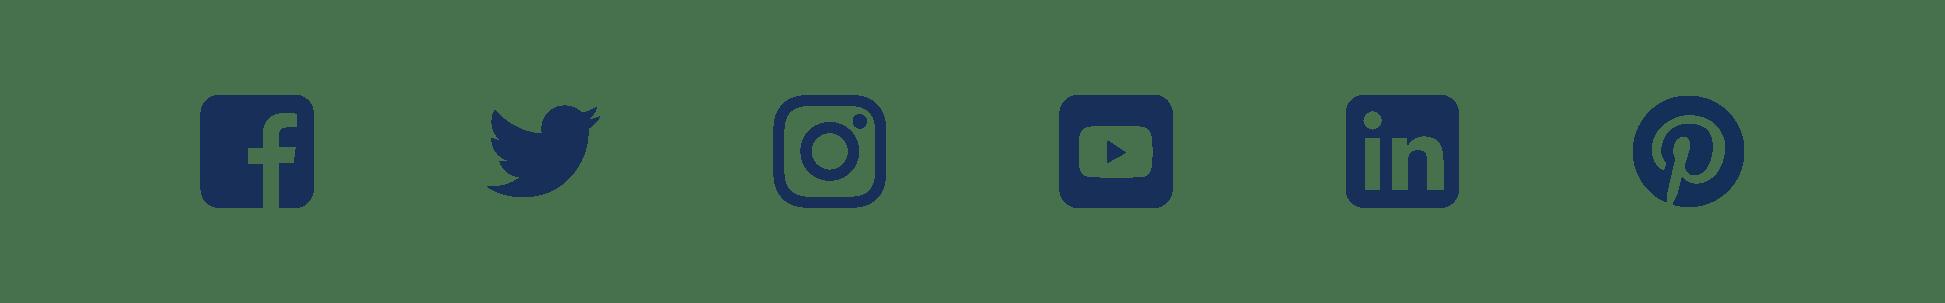 Digital Marketing Software 10